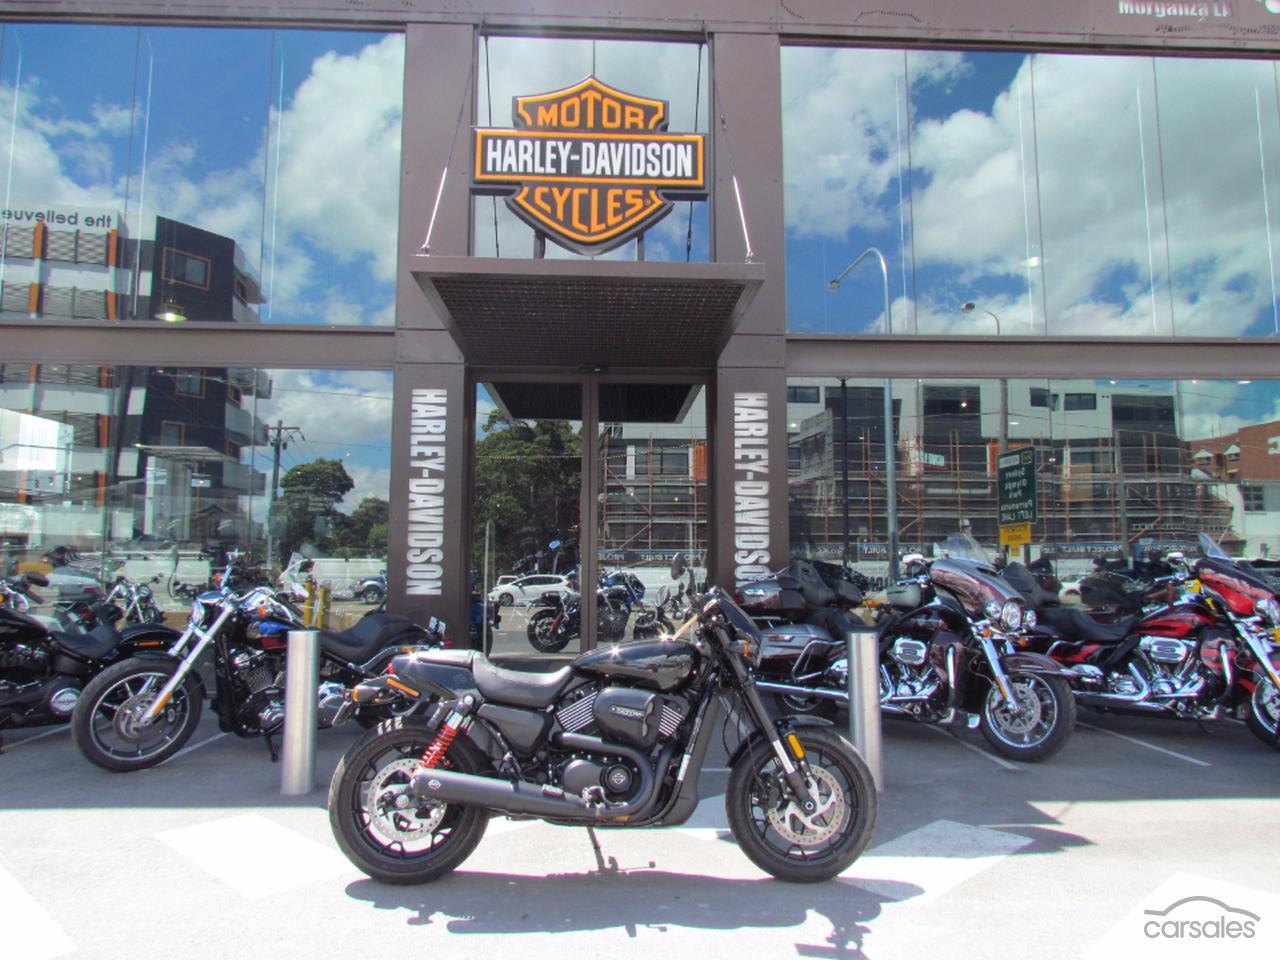 2015 Harley-davidson STREET 750 (XG750)